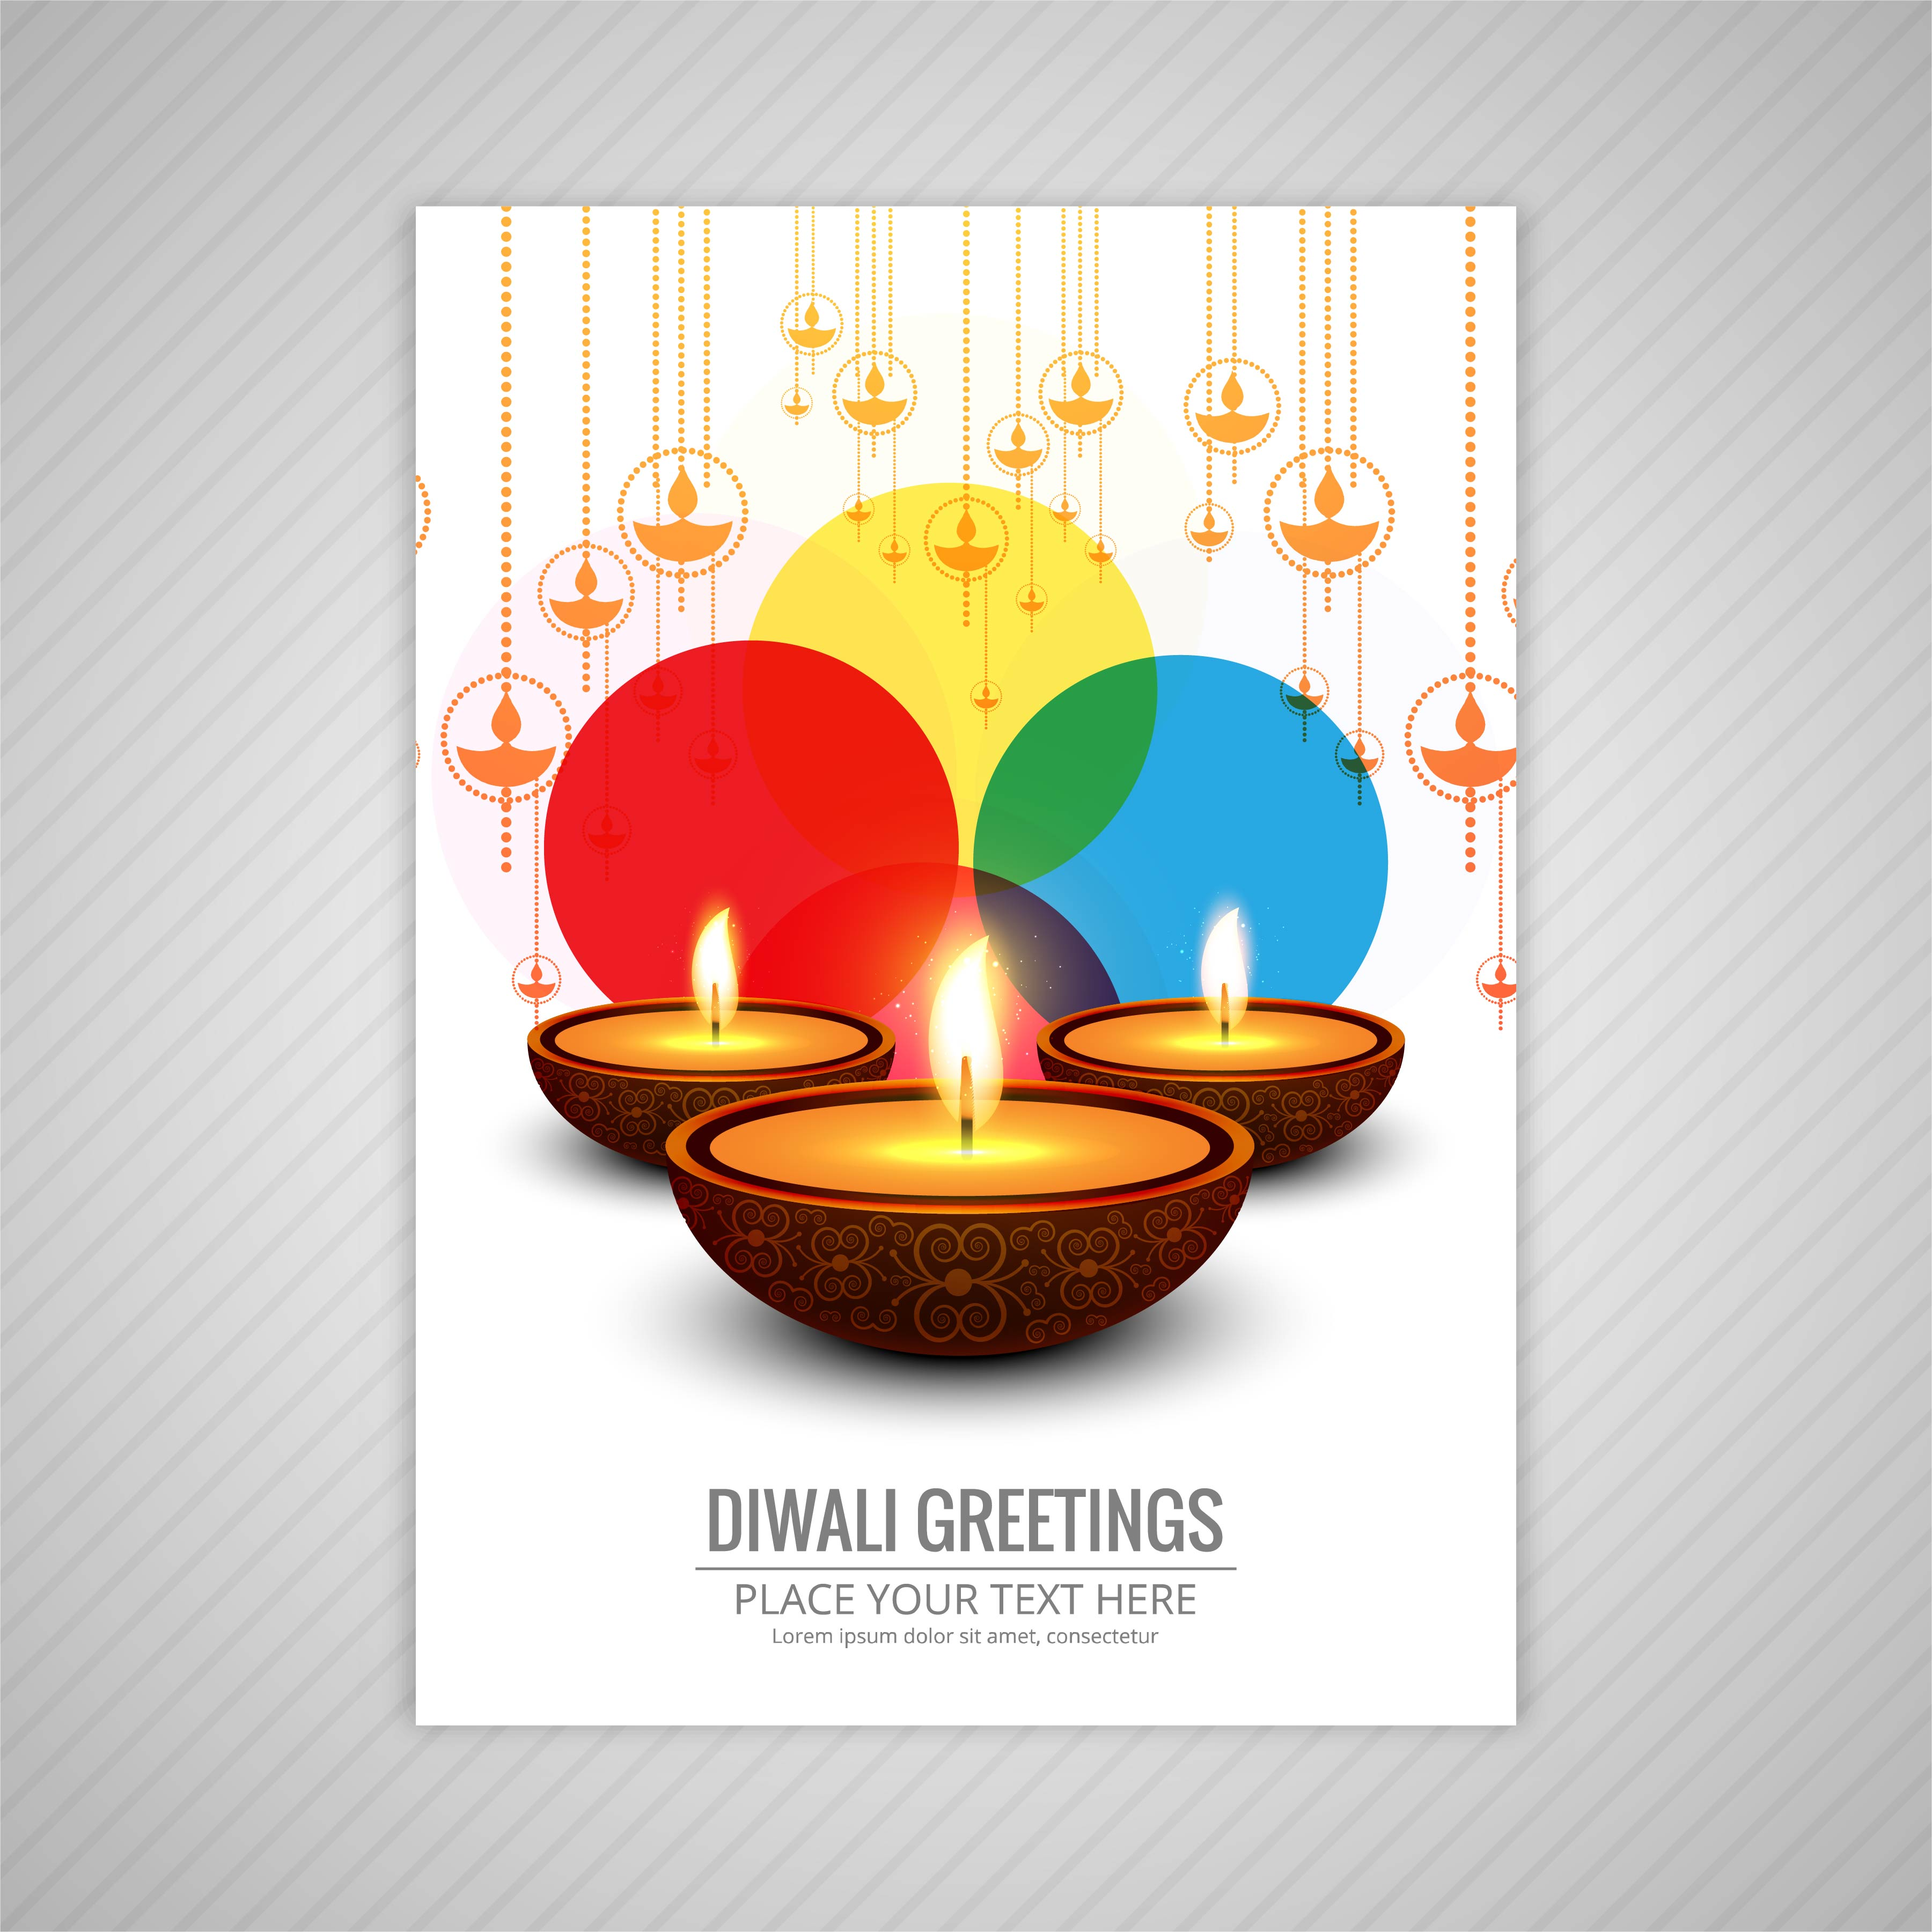 decorative diwali greeting card template design  download